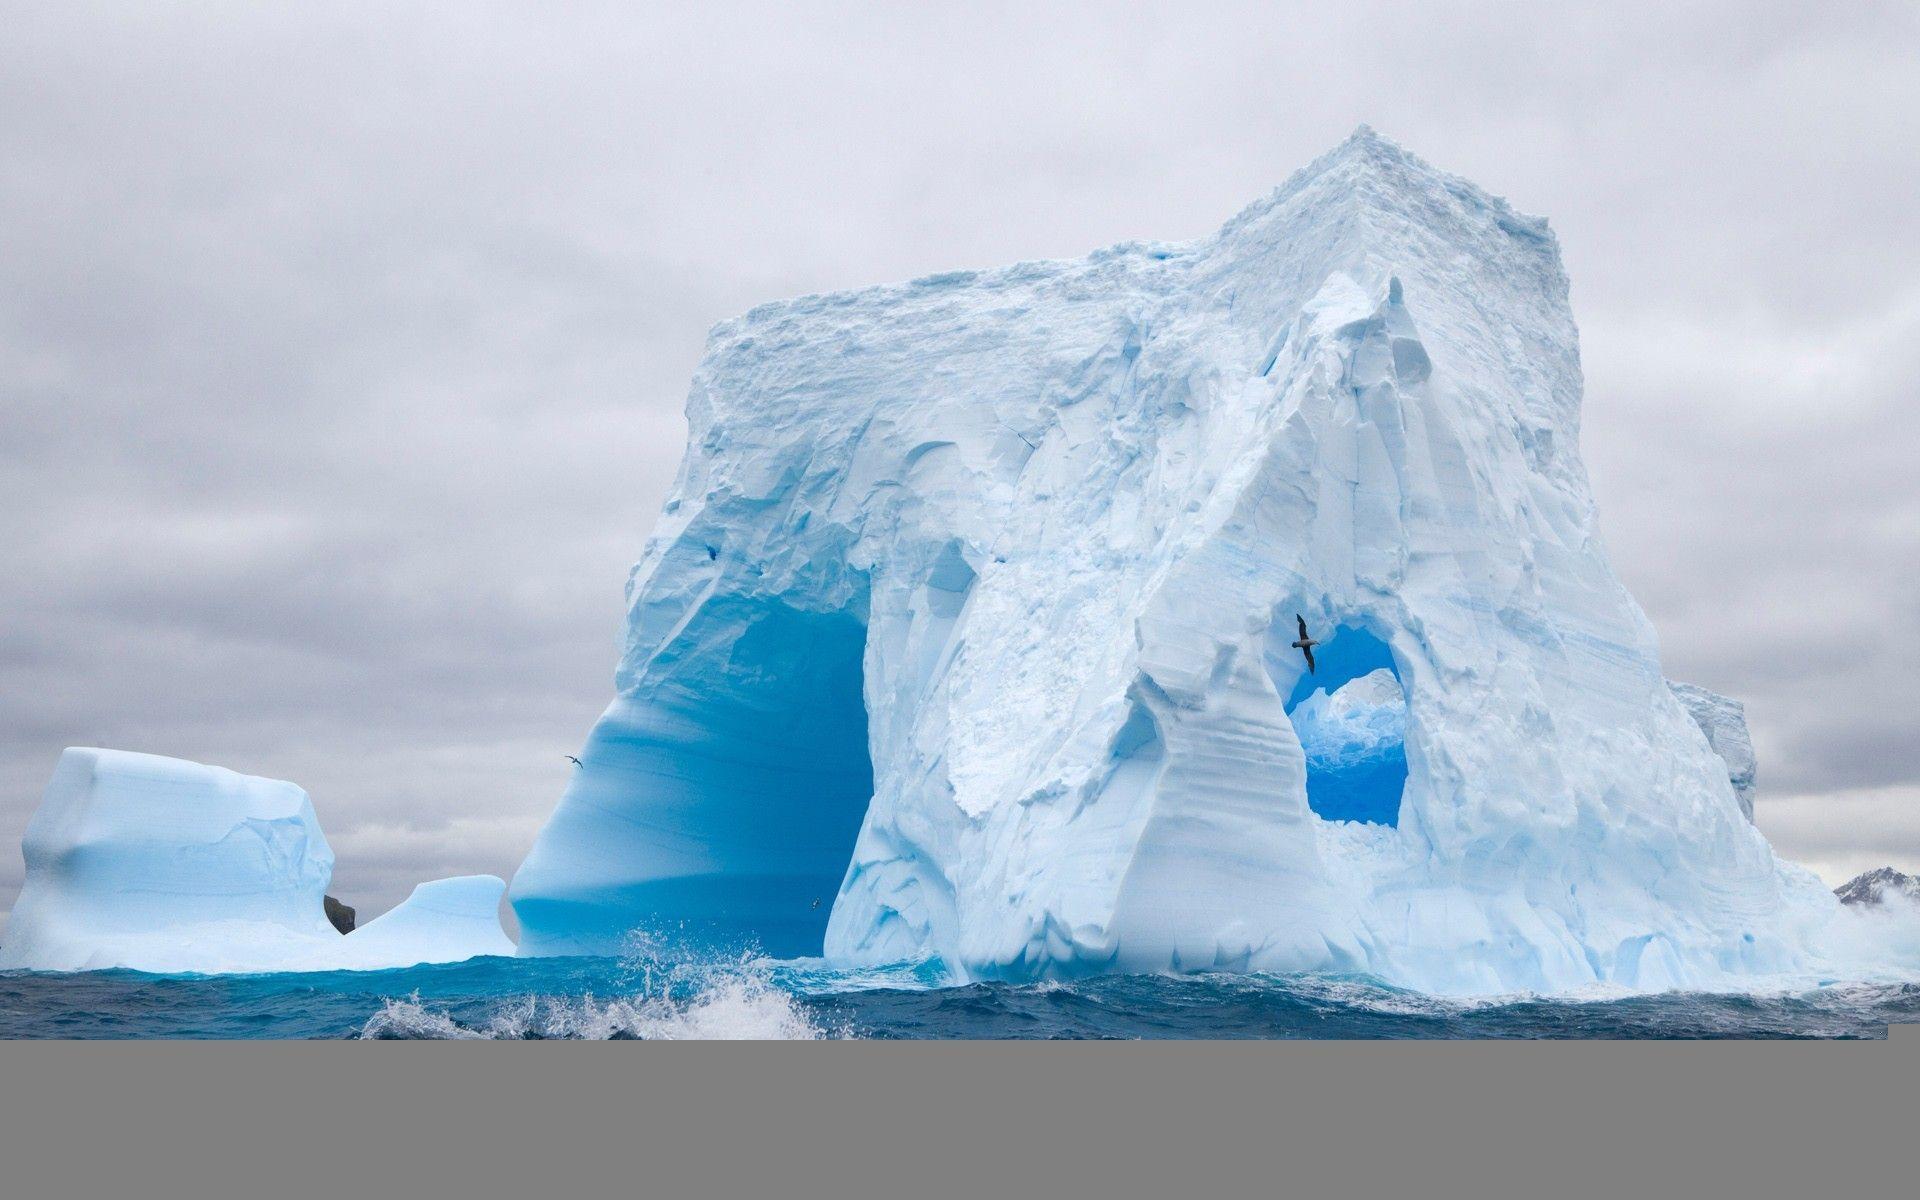 Antarctica HD Wallpapers - Travel HD Wallpapers